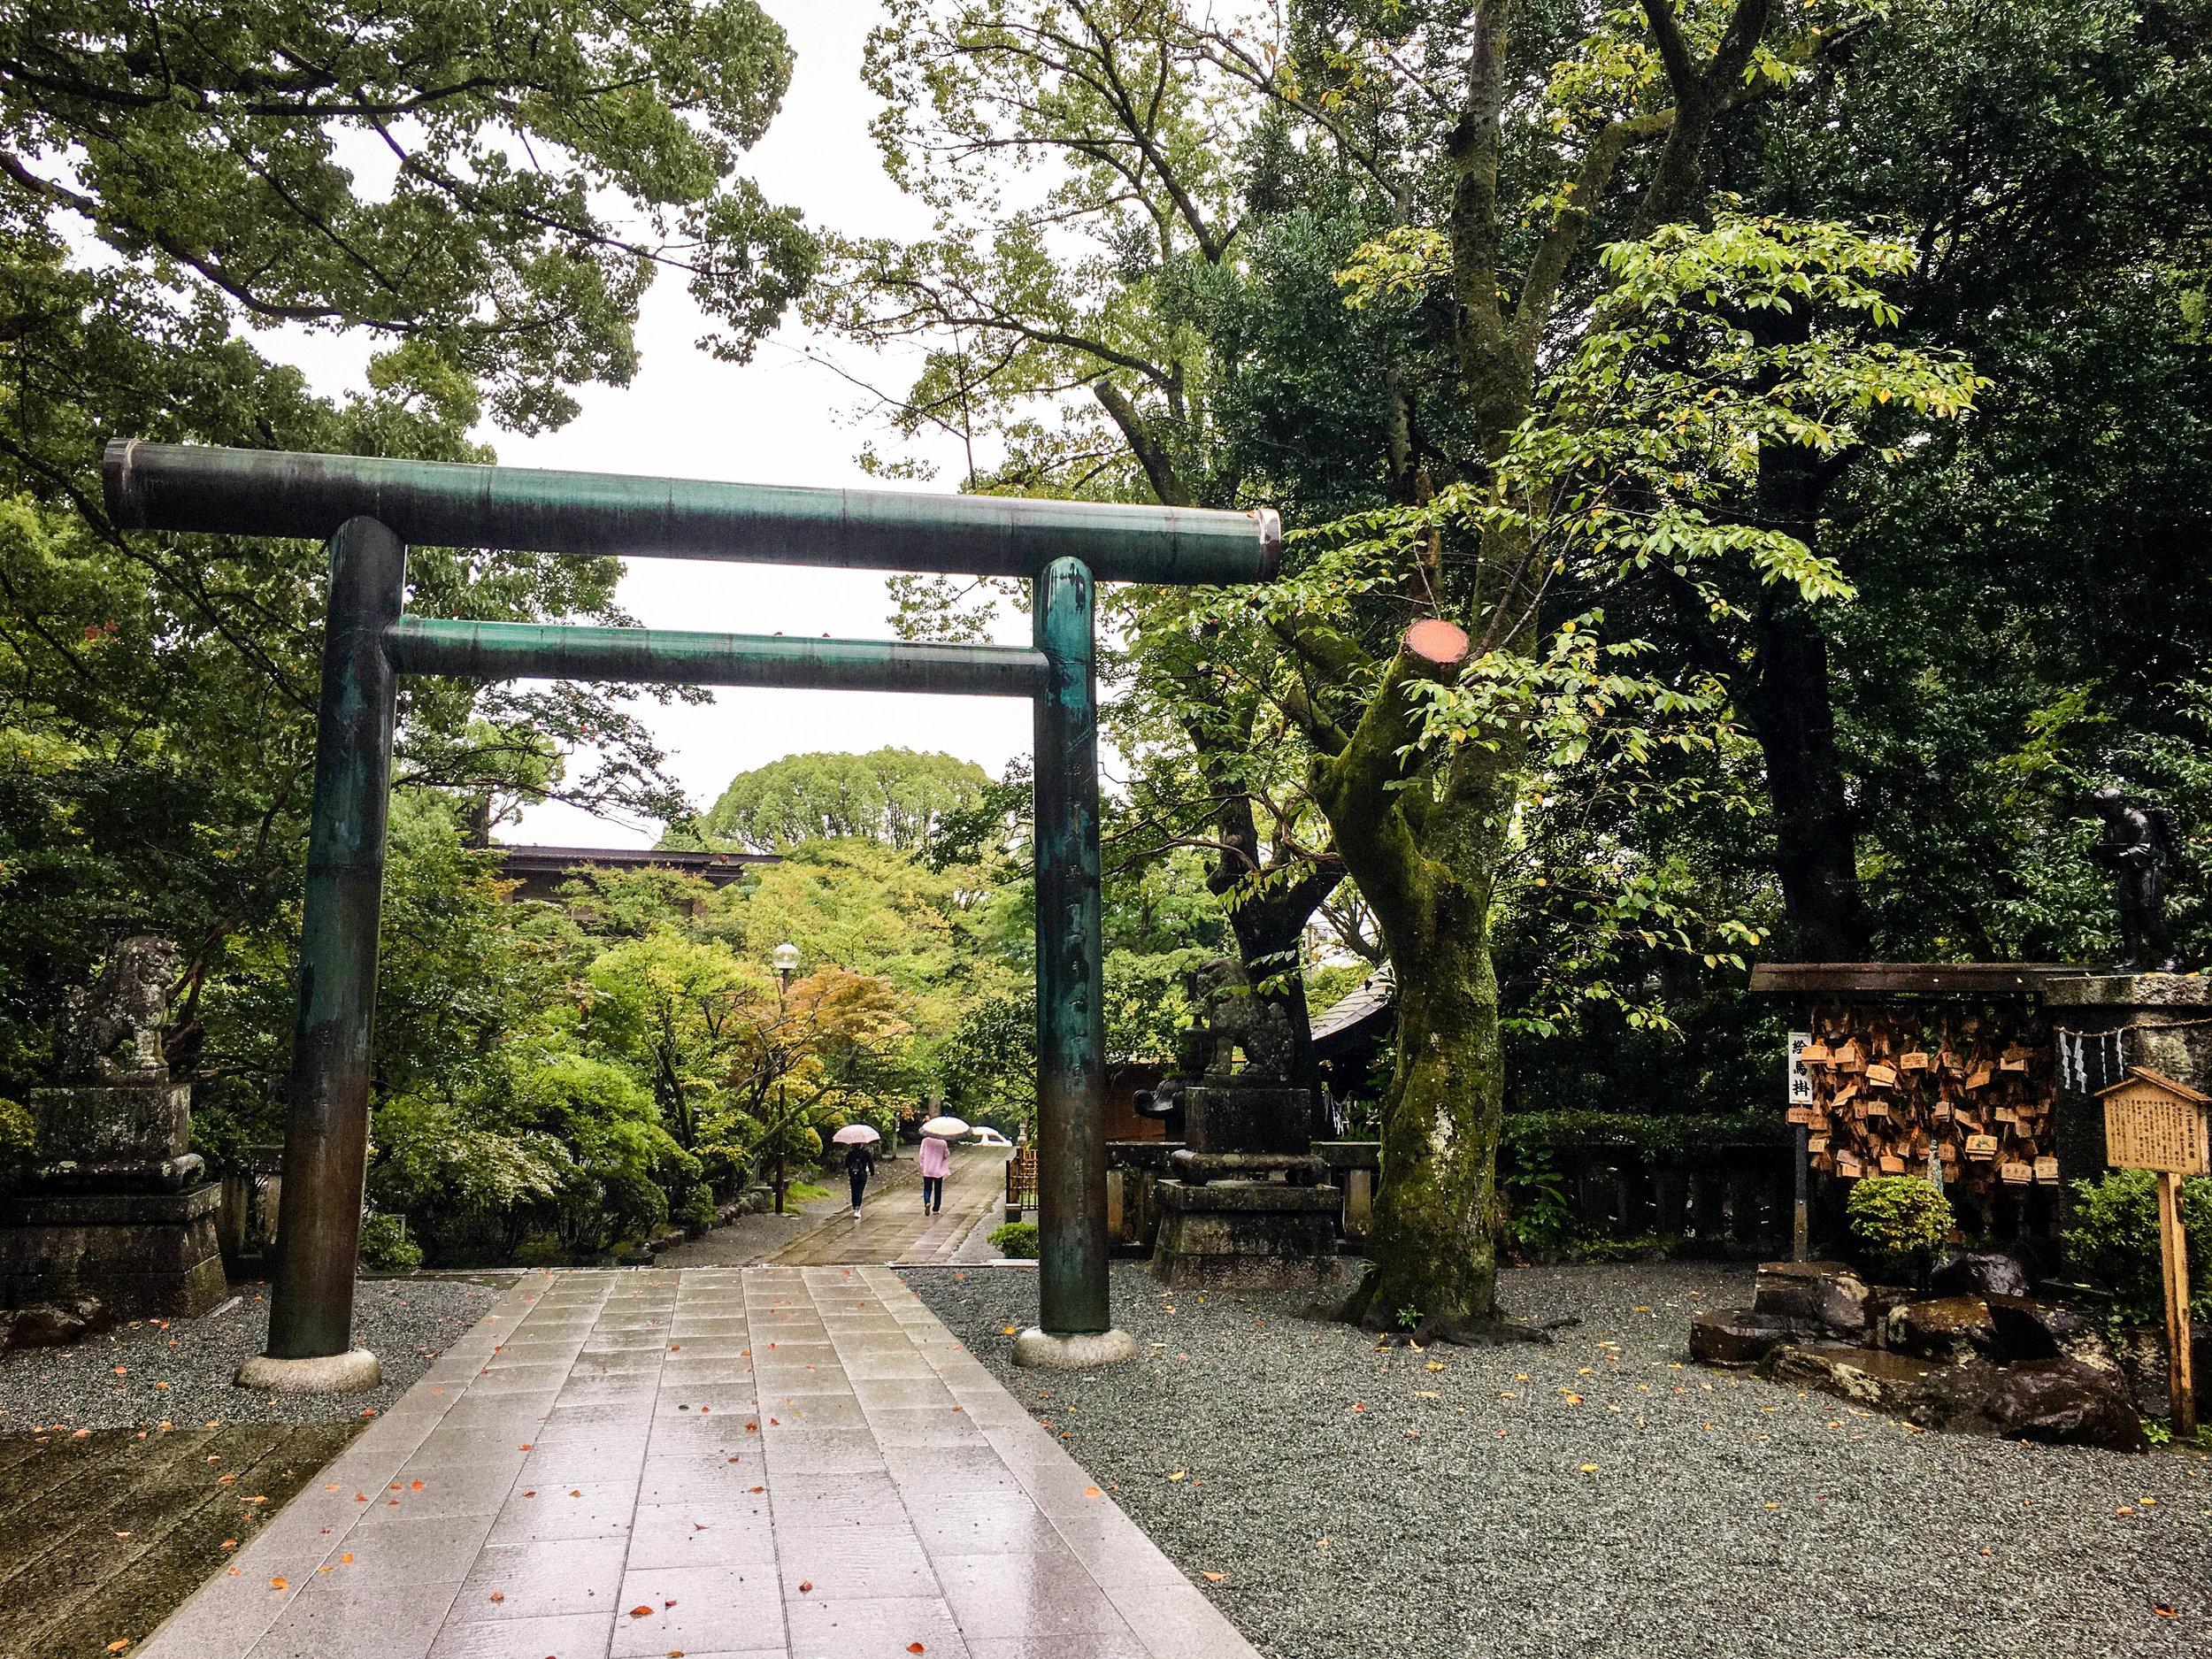 Yogoyi Park. Part of Tokyo itinerary 7 days